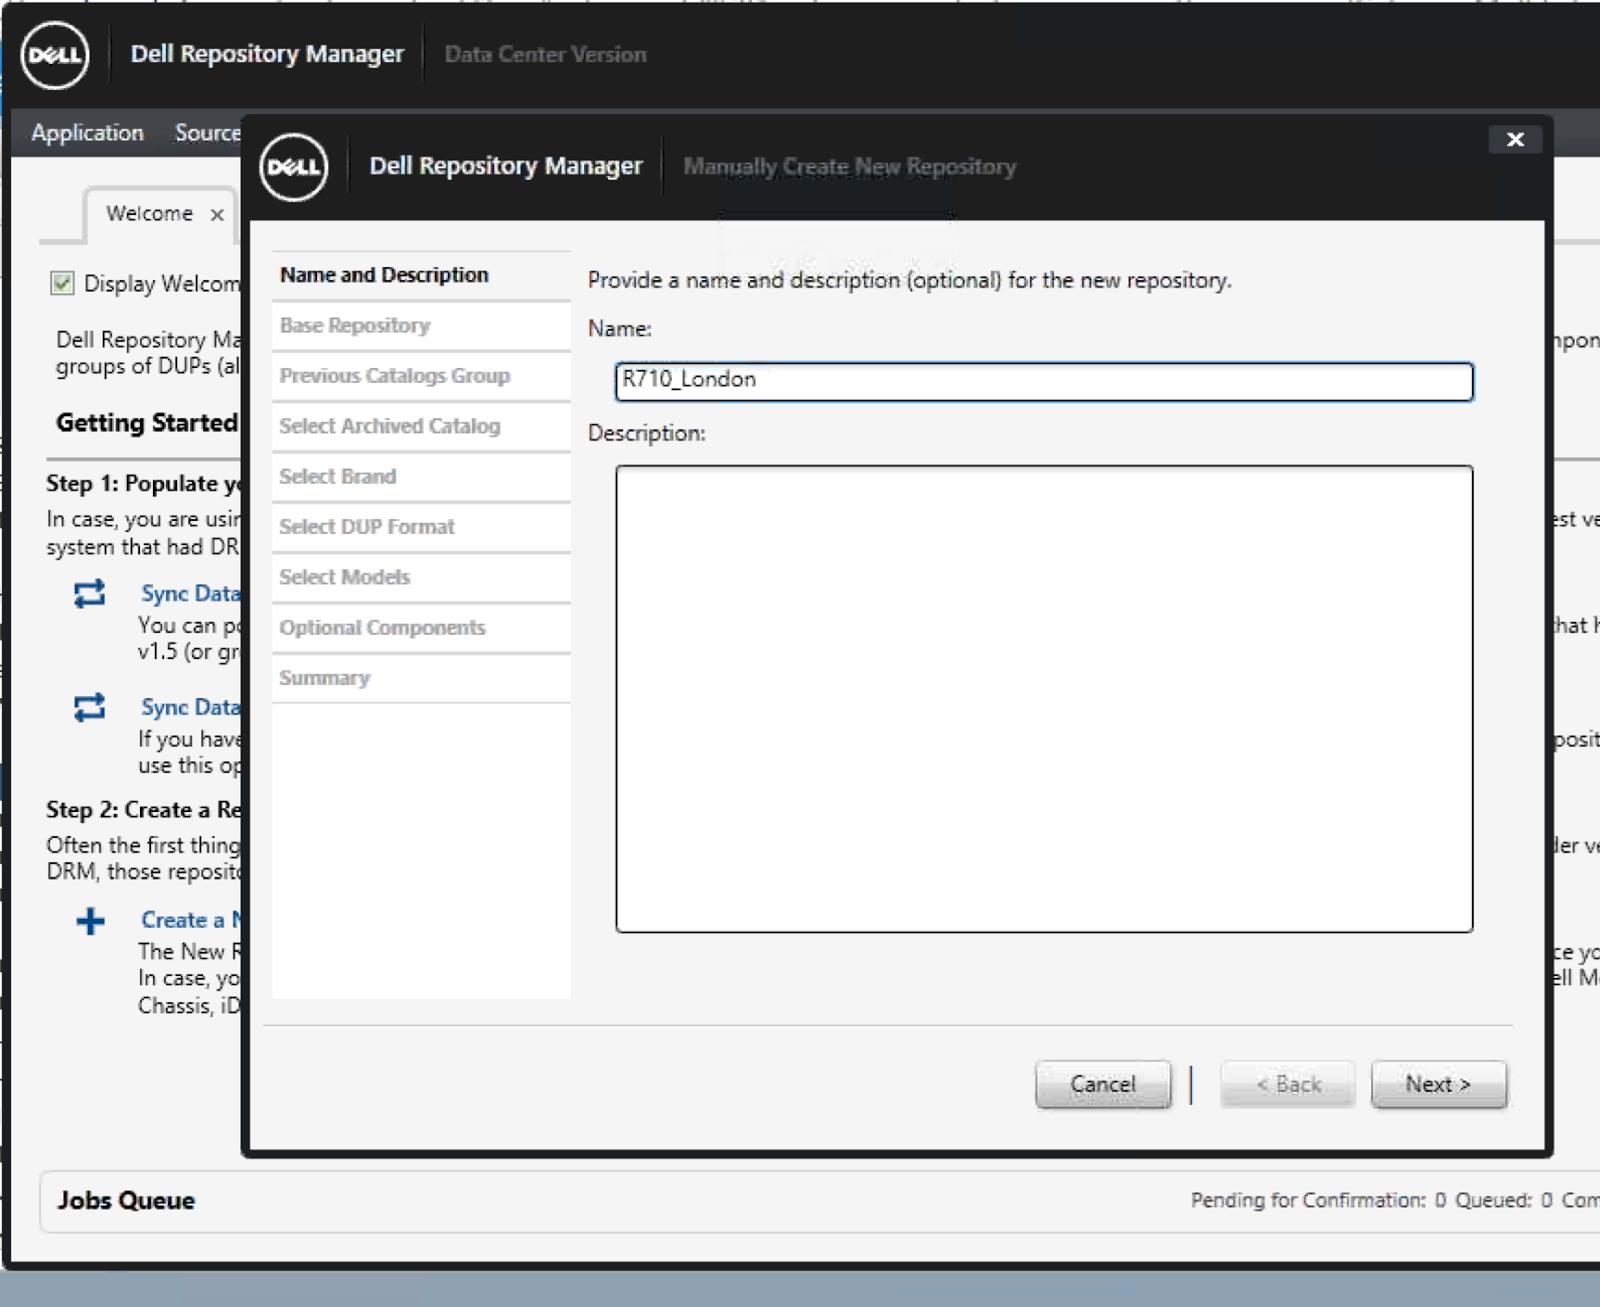 VirtualRealization: Dell rack servers - Upgrade firmware